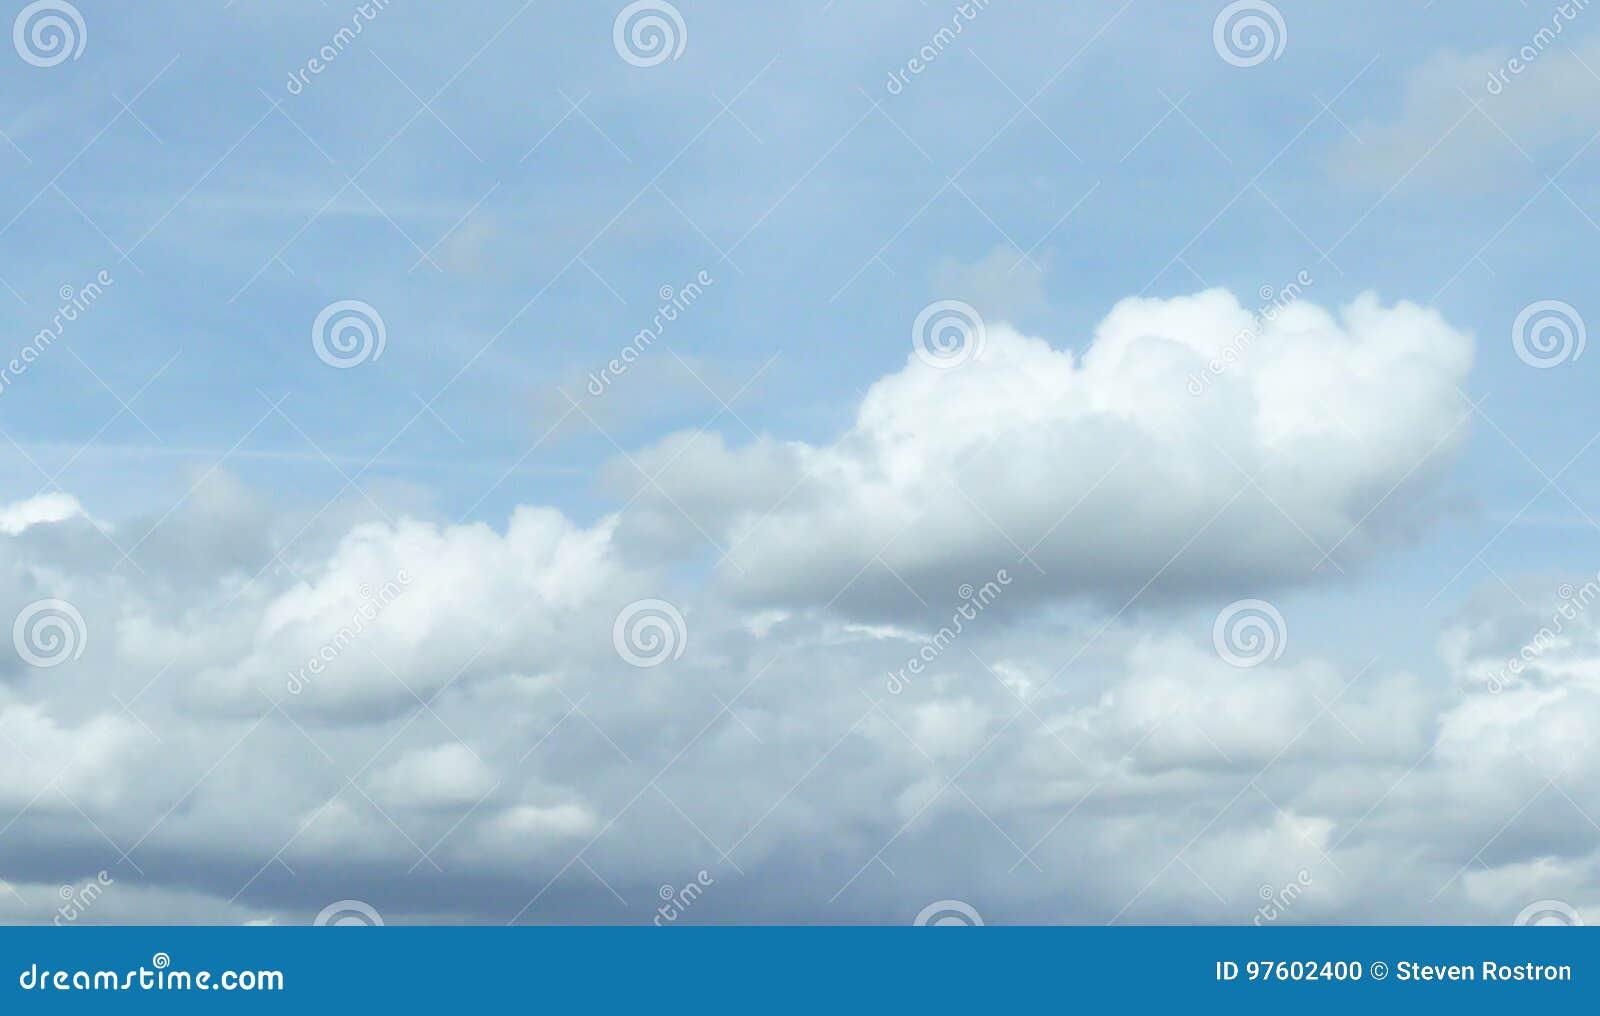 Weiße flaumige Wolken in Pale Blue Sky